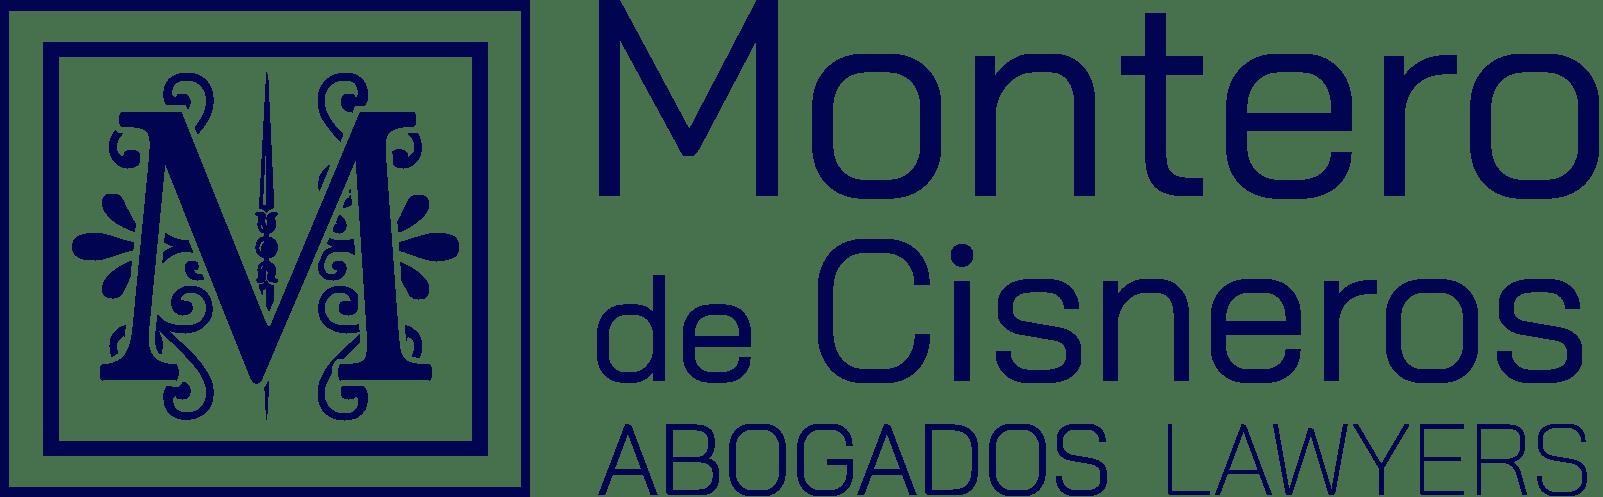 Montero de Cisneros